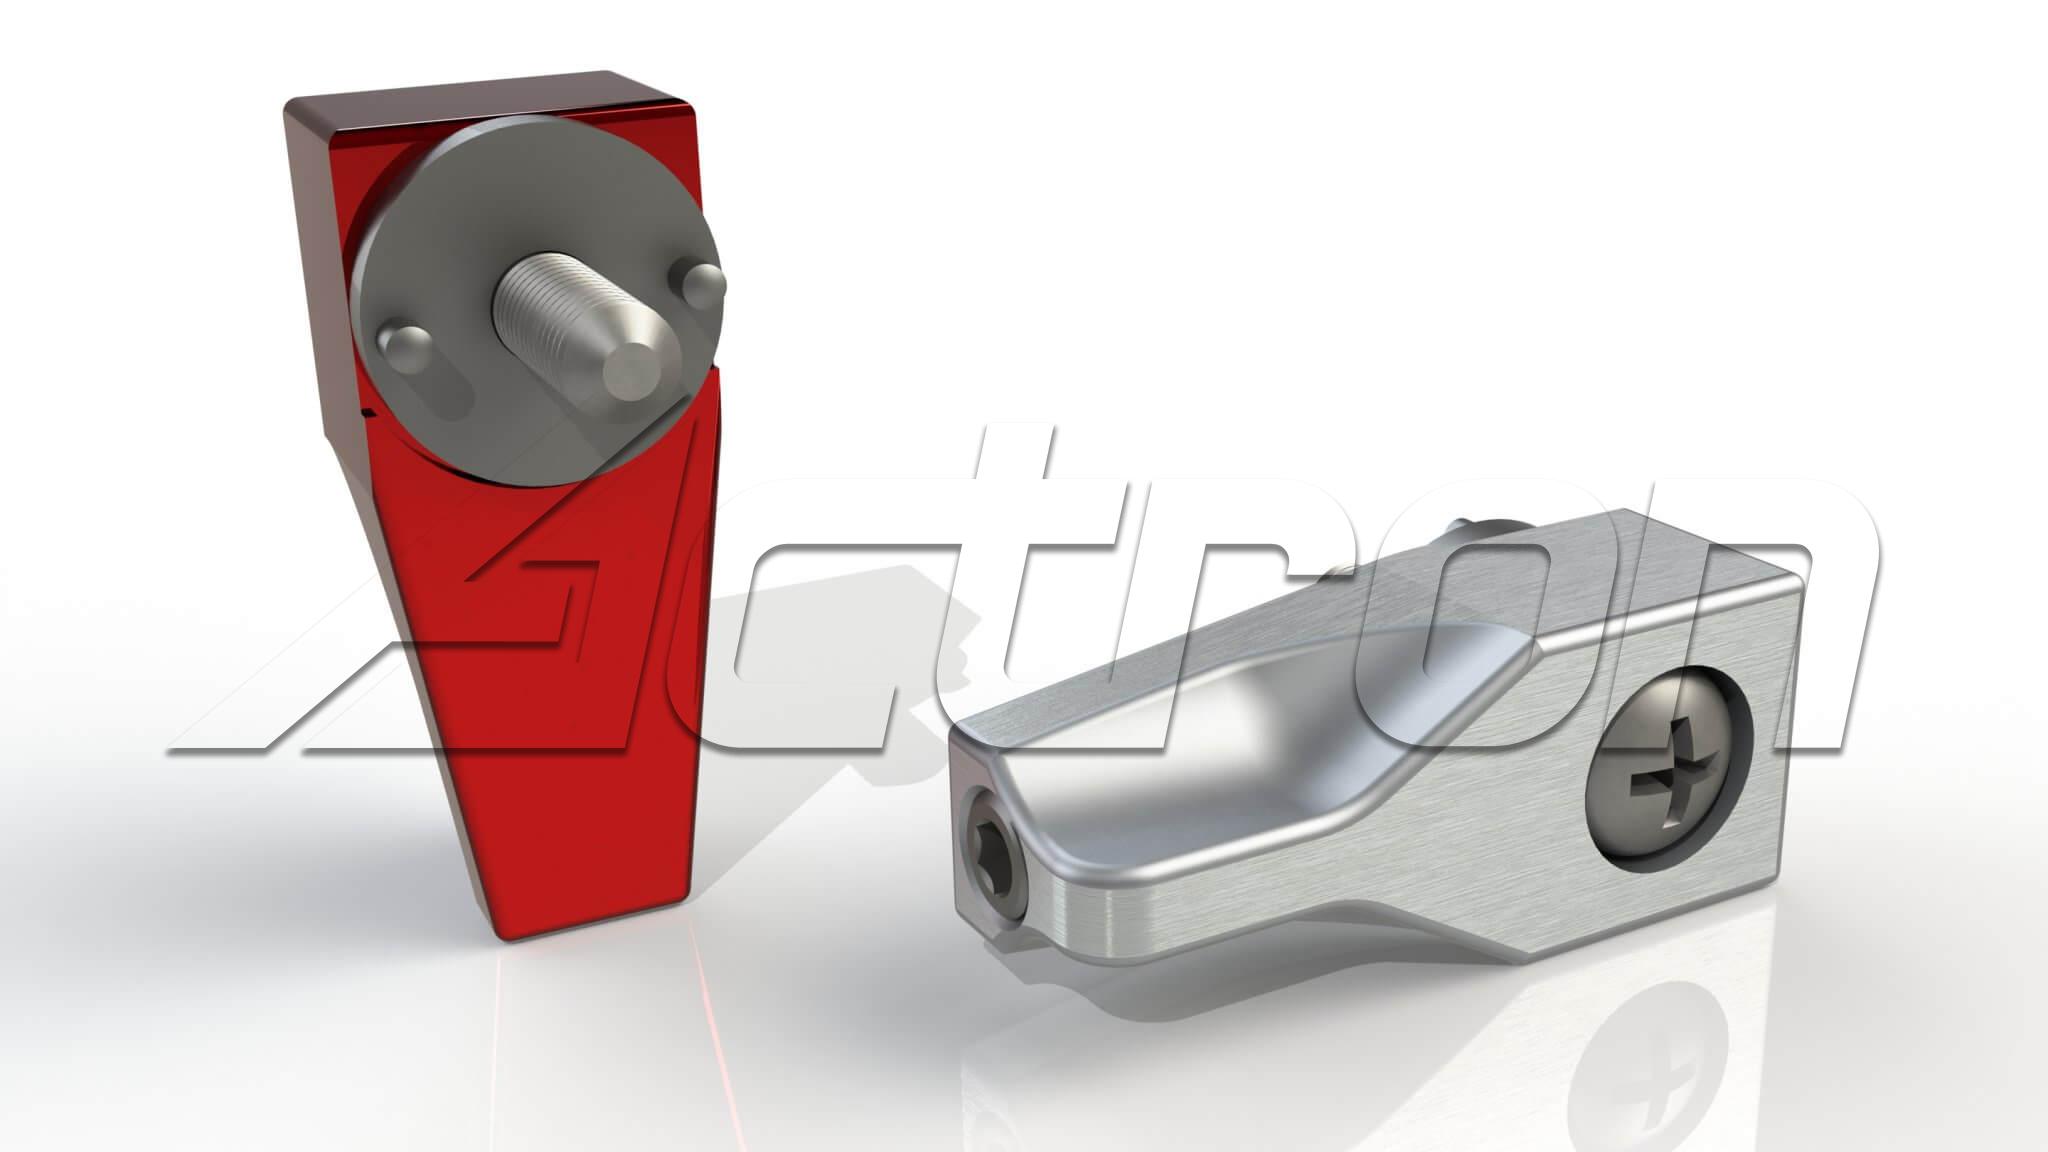 1-4-turn-retainer-4809-a35591.jpg